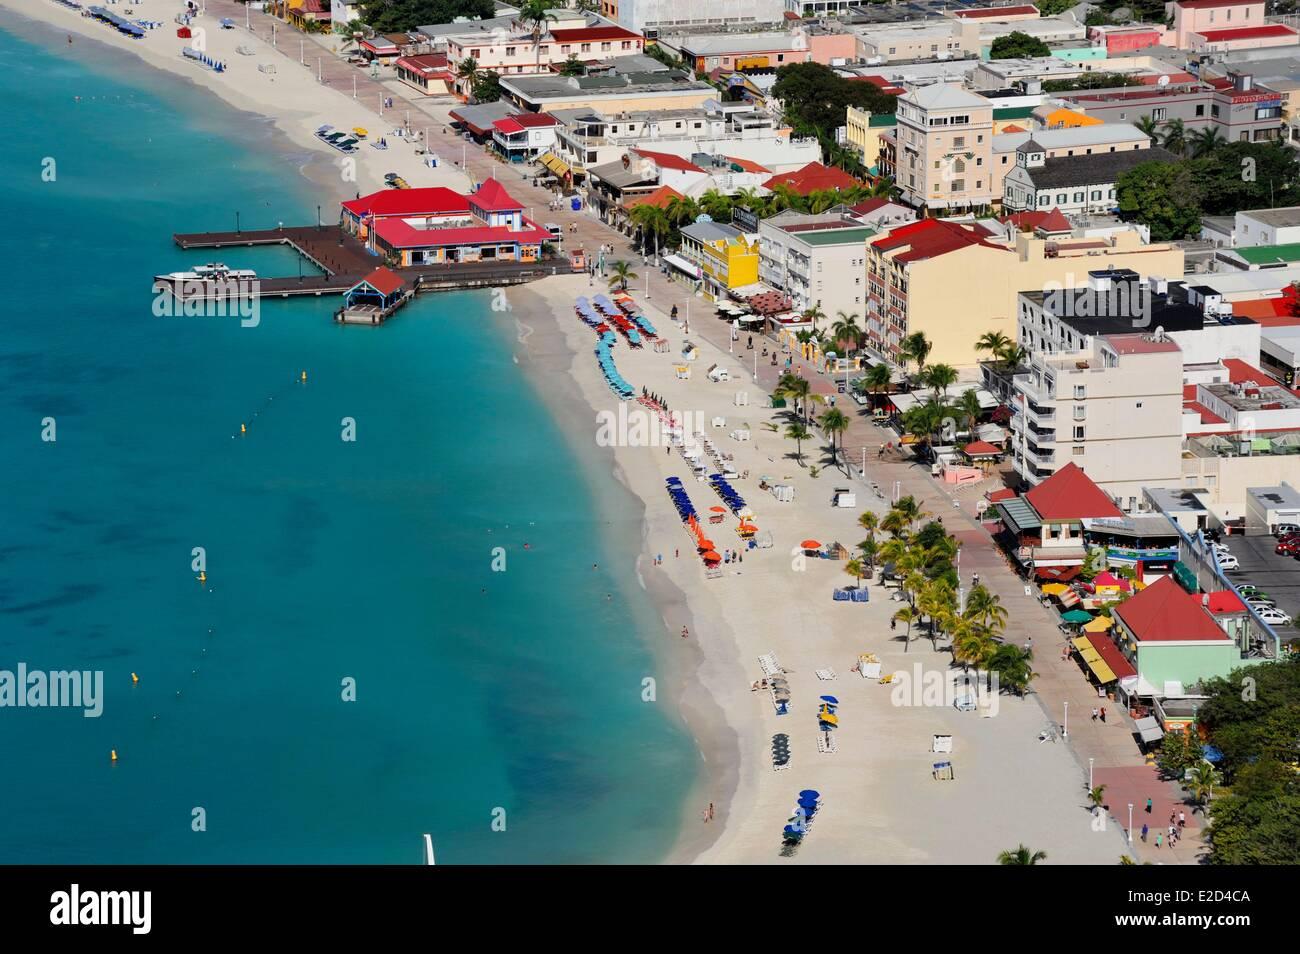 Netherlands Netherlands Antilles Saint Martin (Sint Maarten) Philipsburg capital of the Dutch side of the island - Stock Image